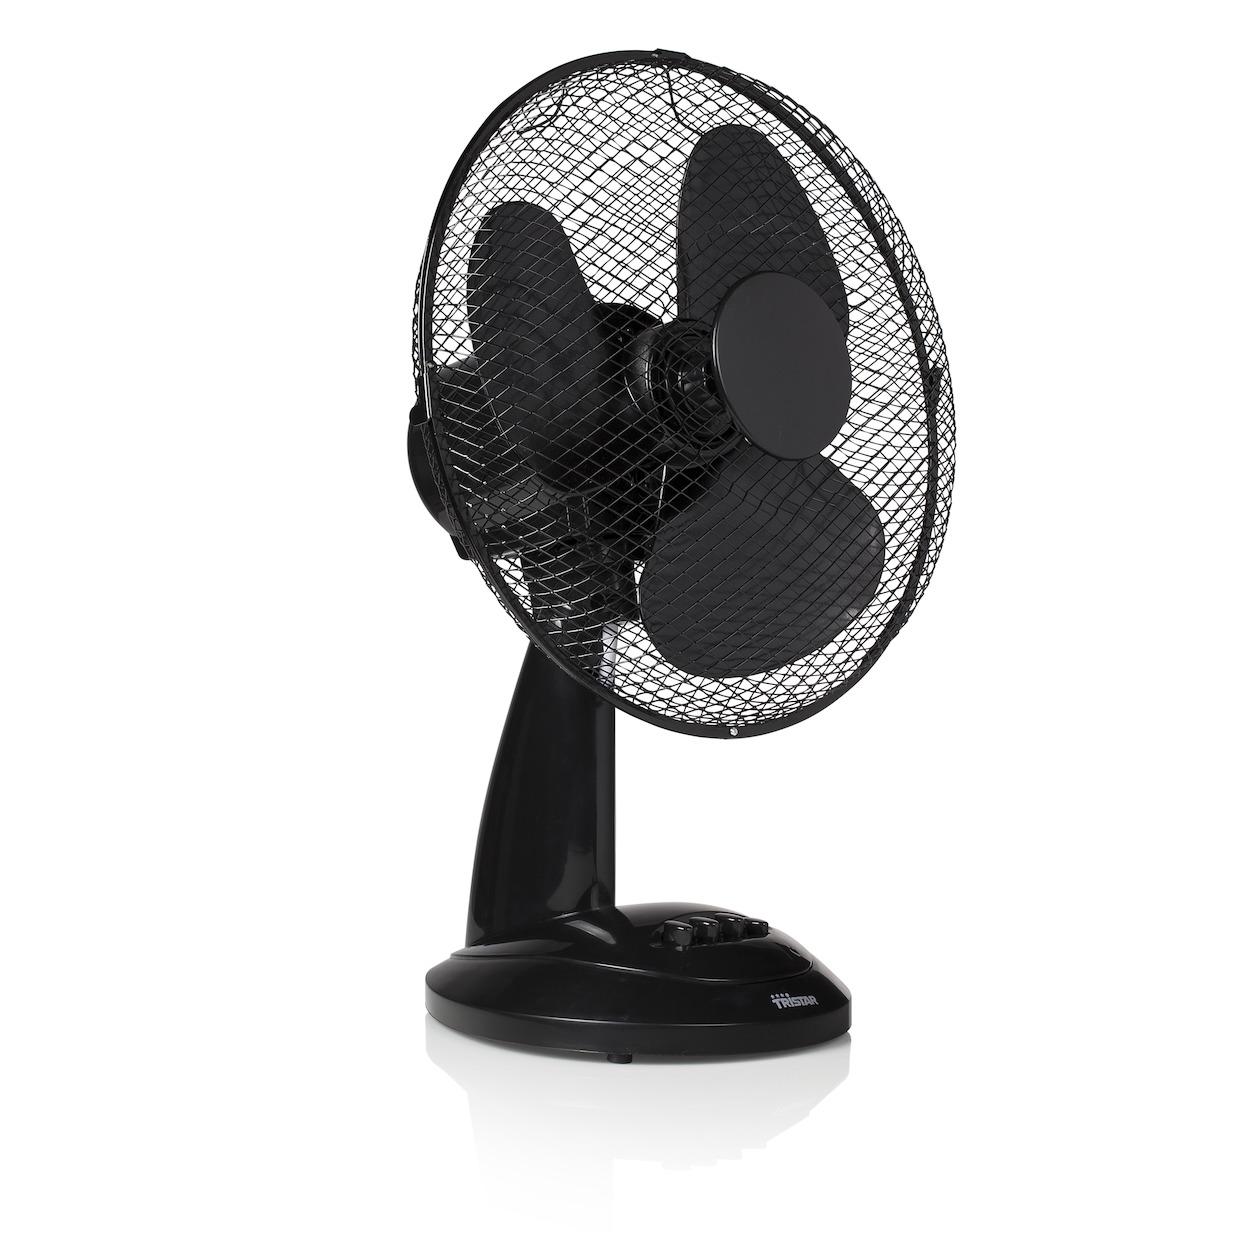 Tristar ventilator VE-5931 - Prijsvergelijk